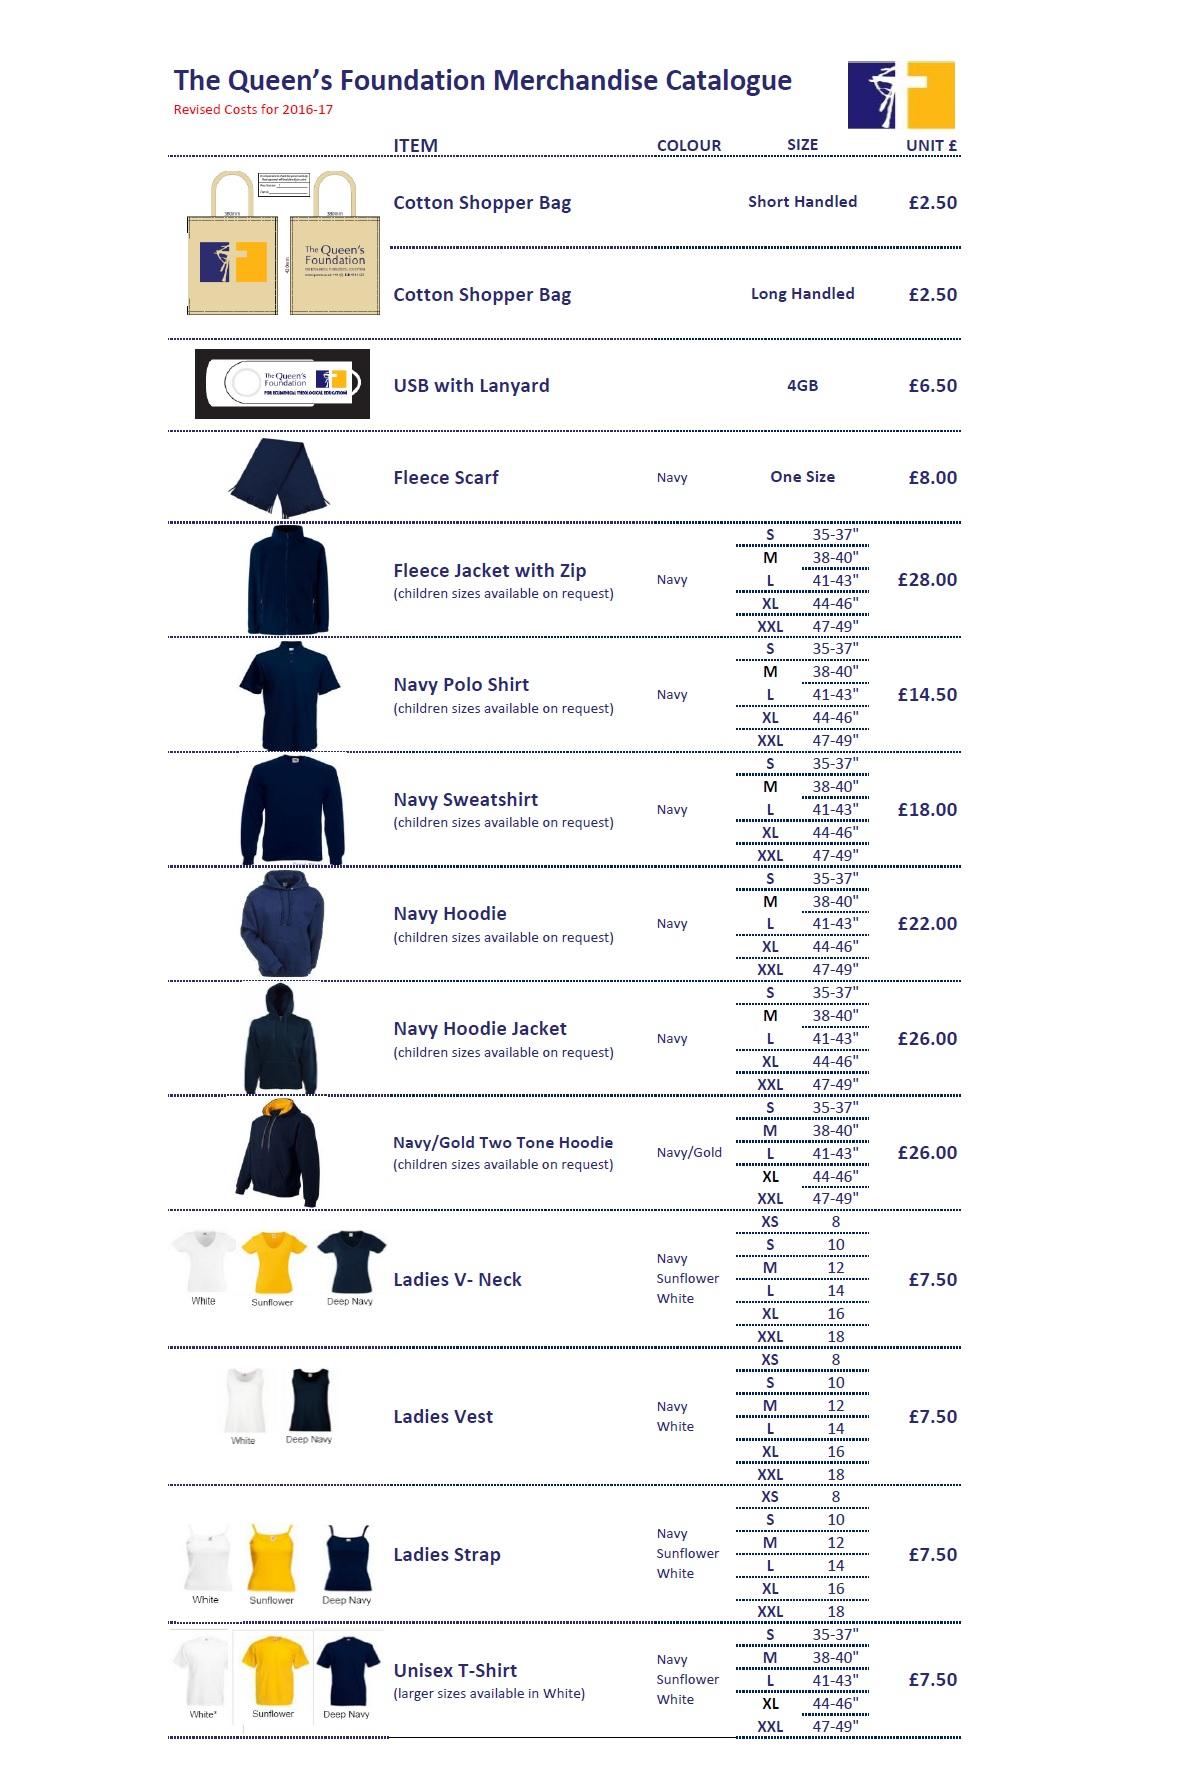 Attachment Merchandise Catalogue V3.jpg